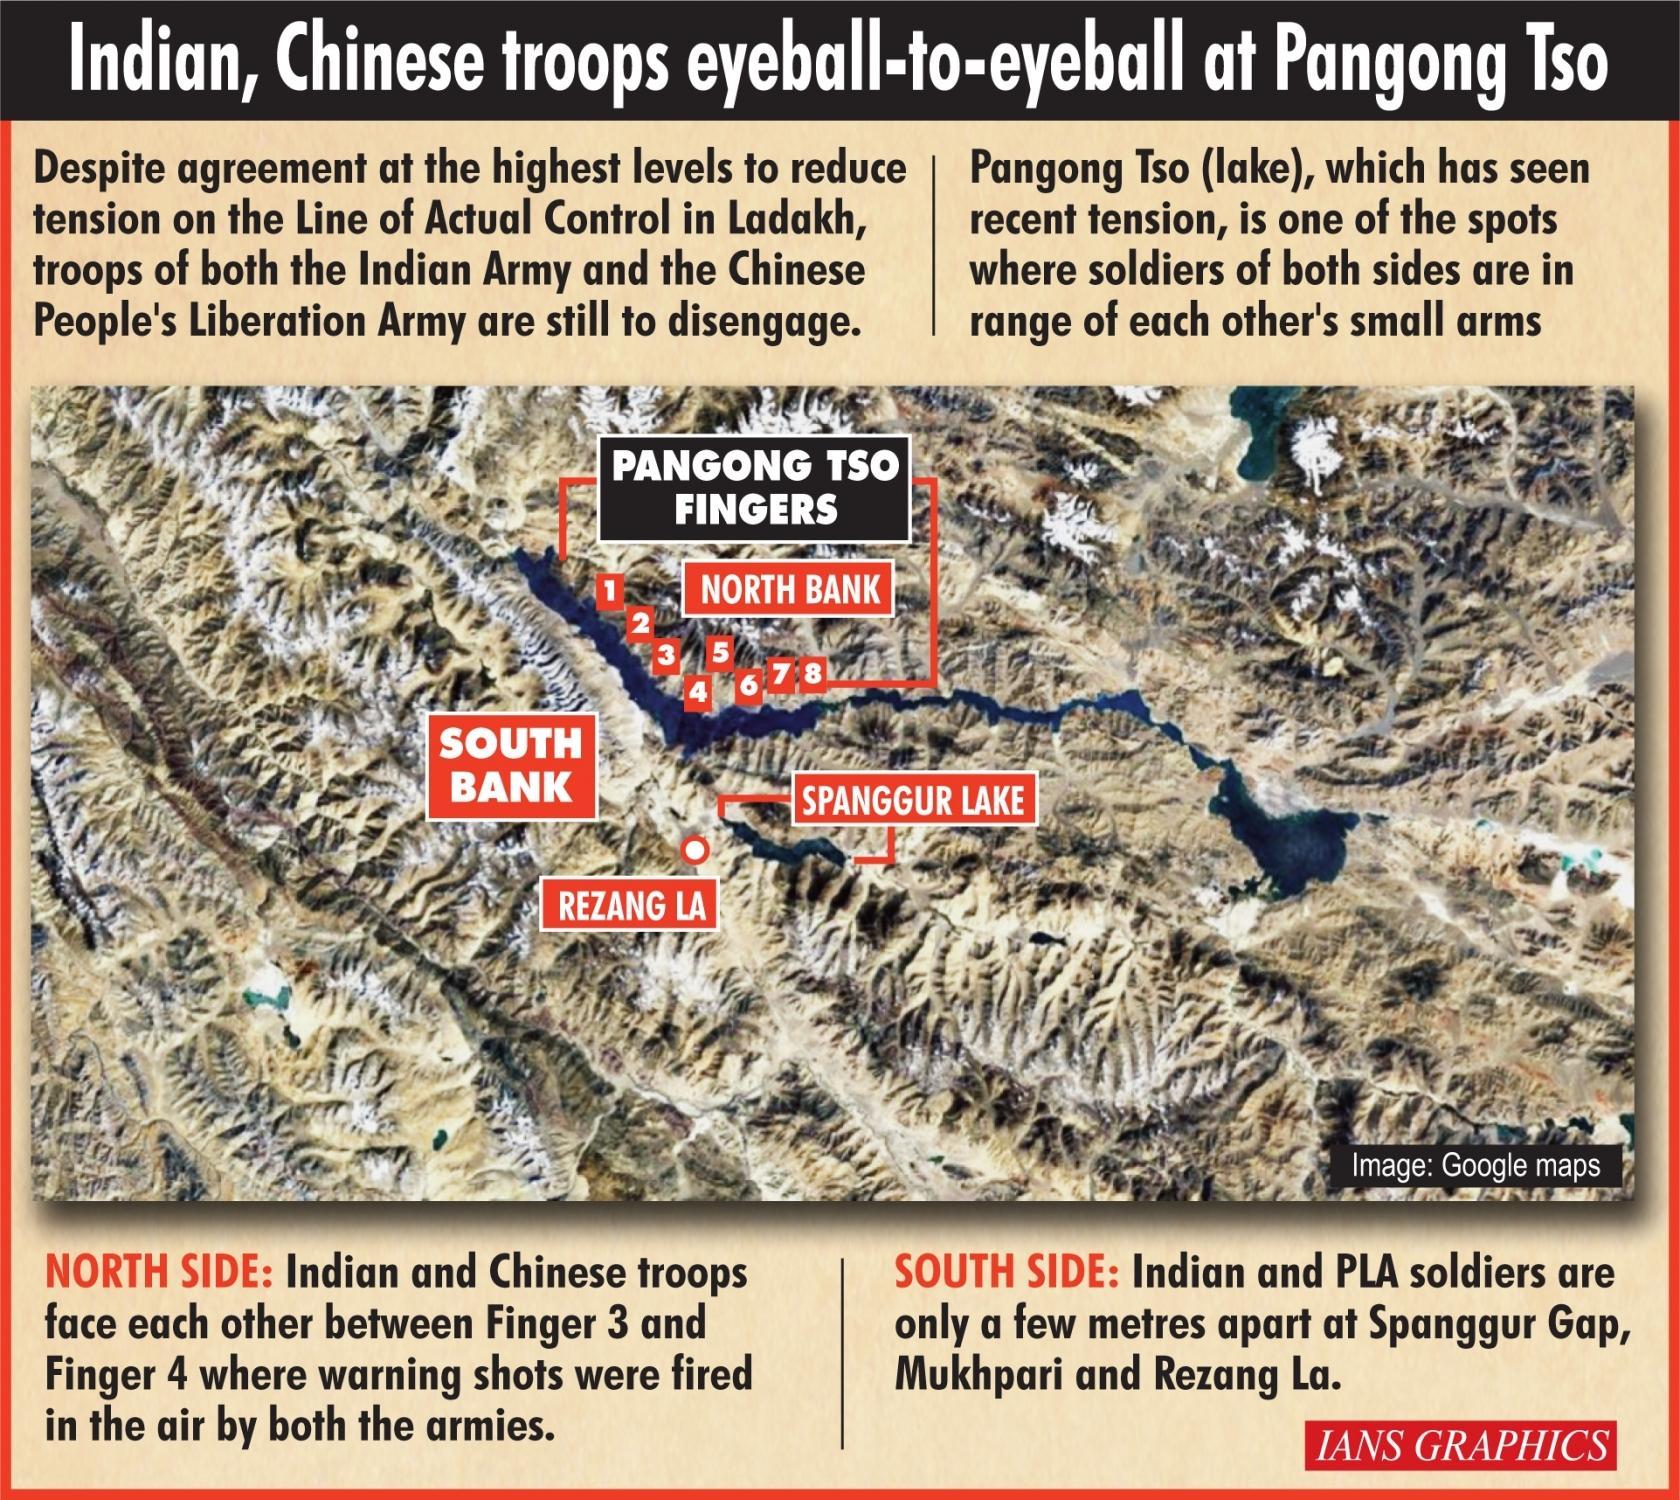 Indian, Chinese troops in rifle range at 4 places at Pangong Lake